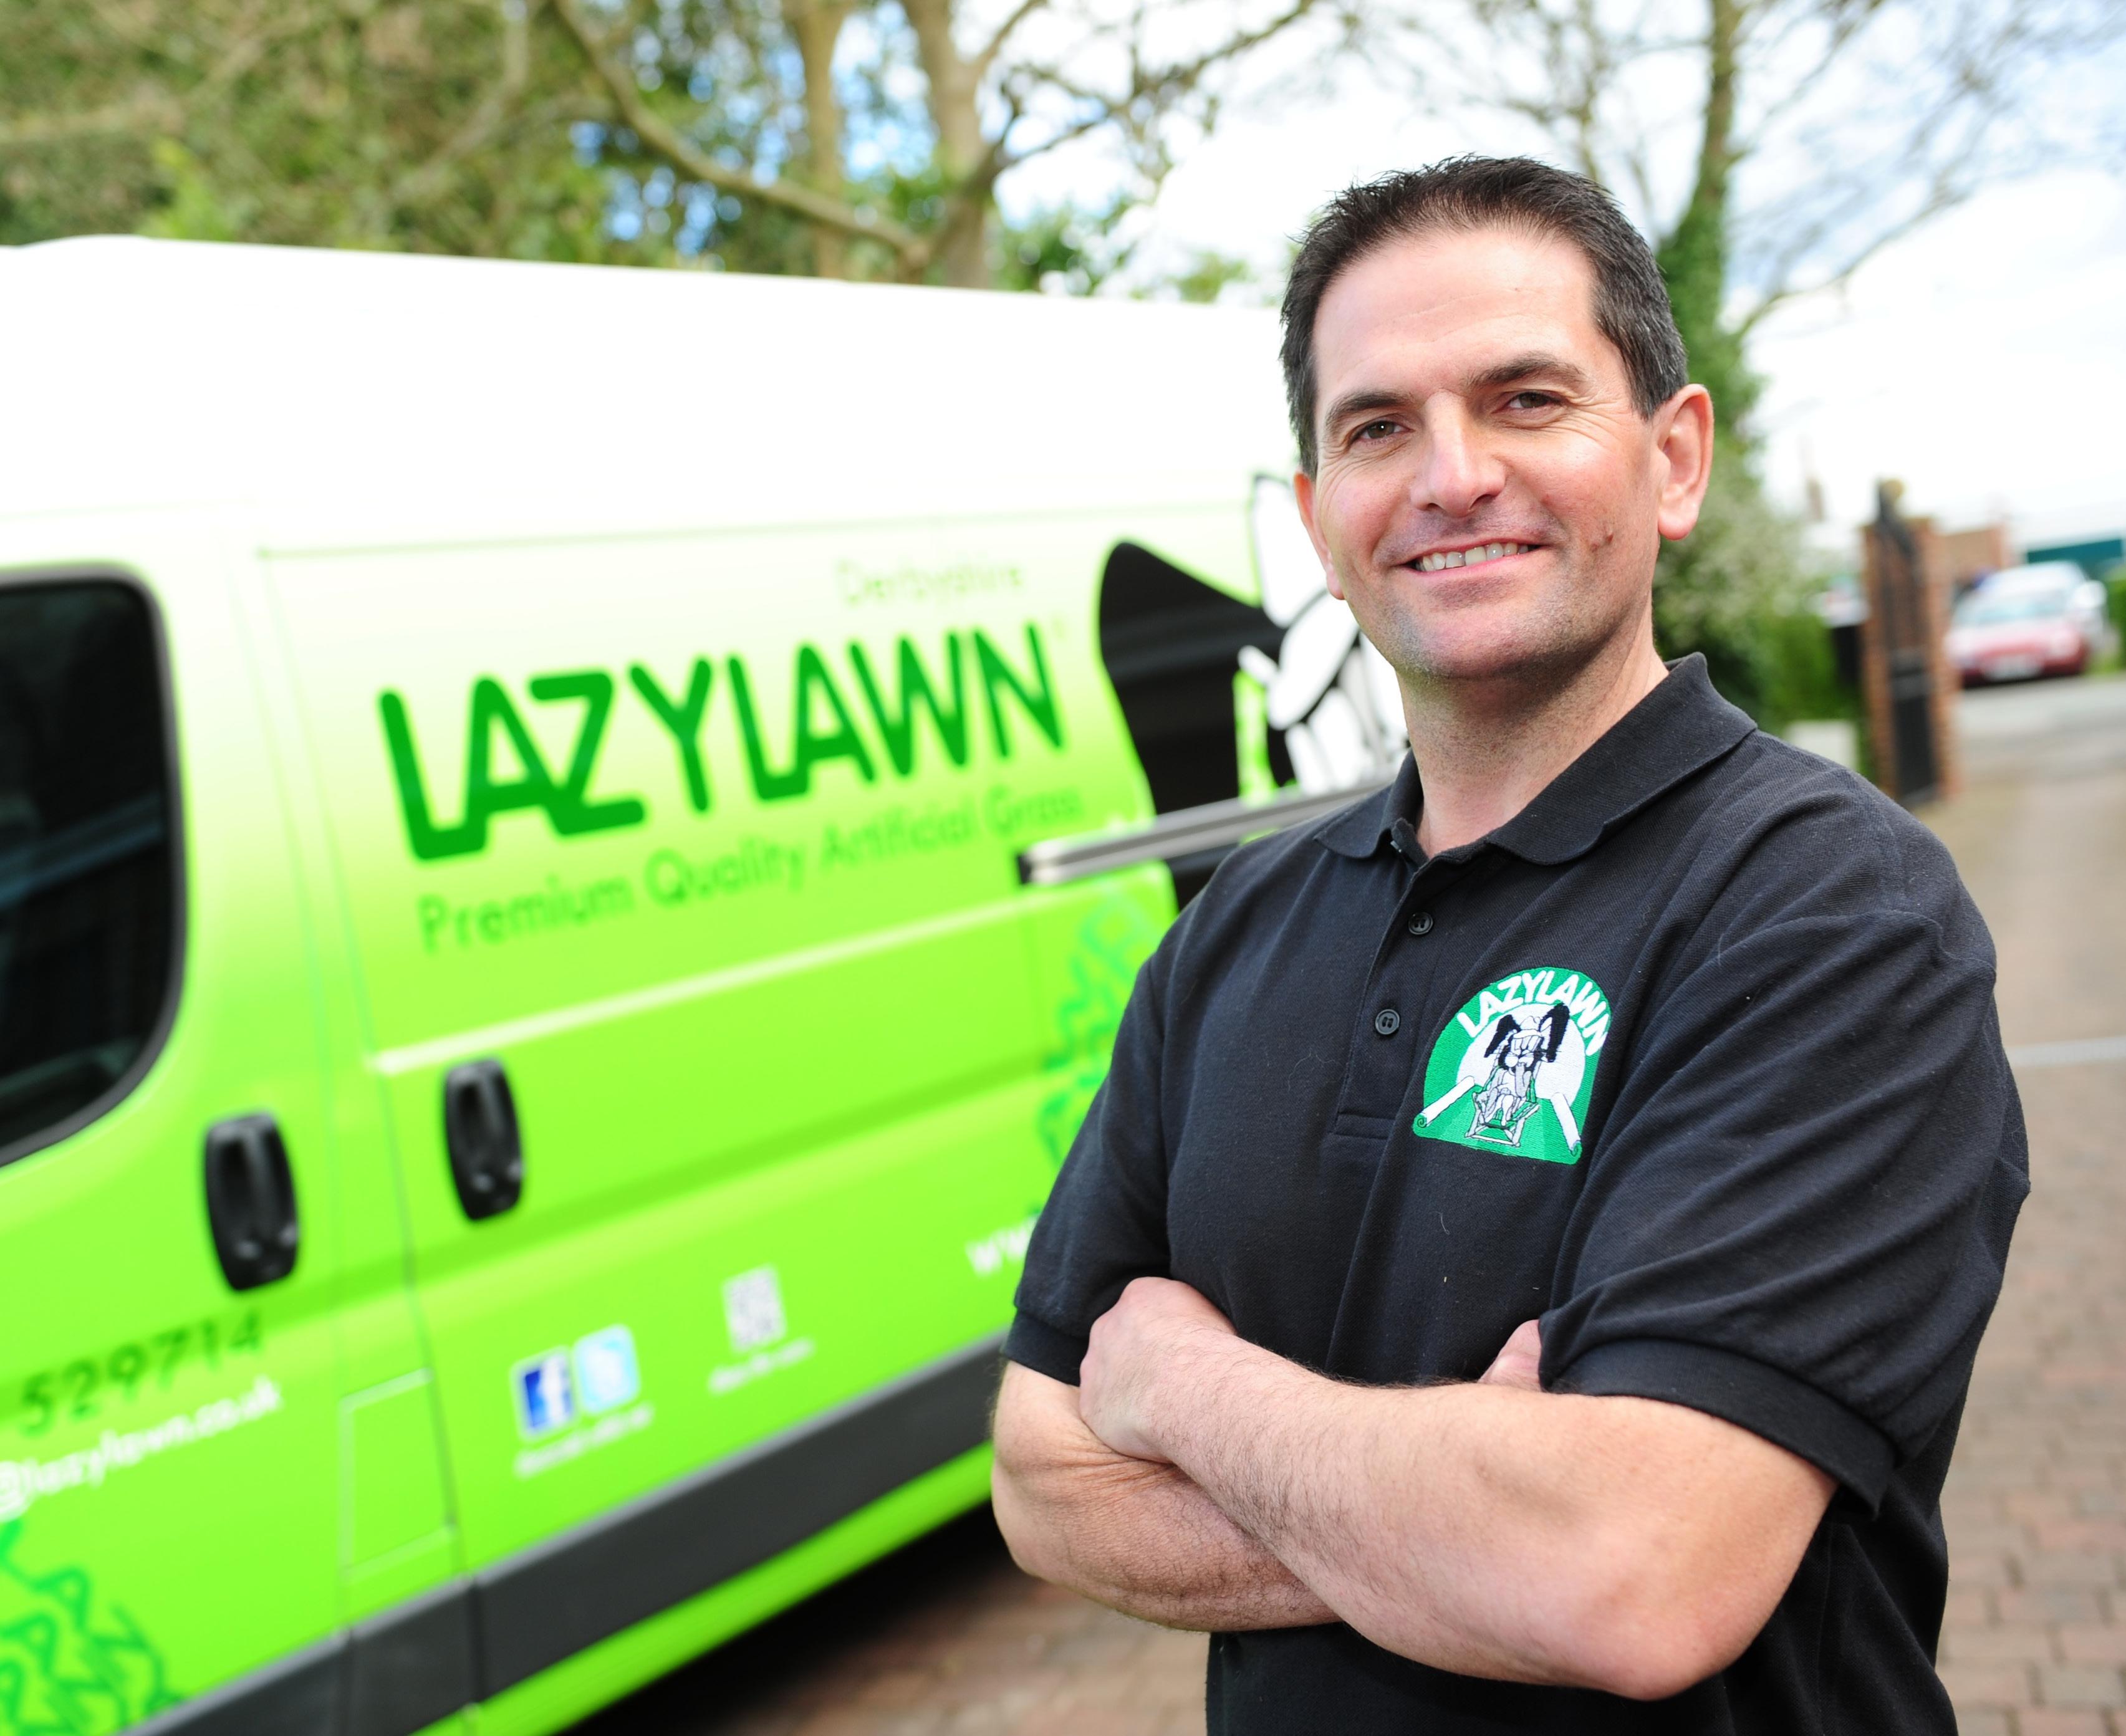 LazyLawn® Taunton